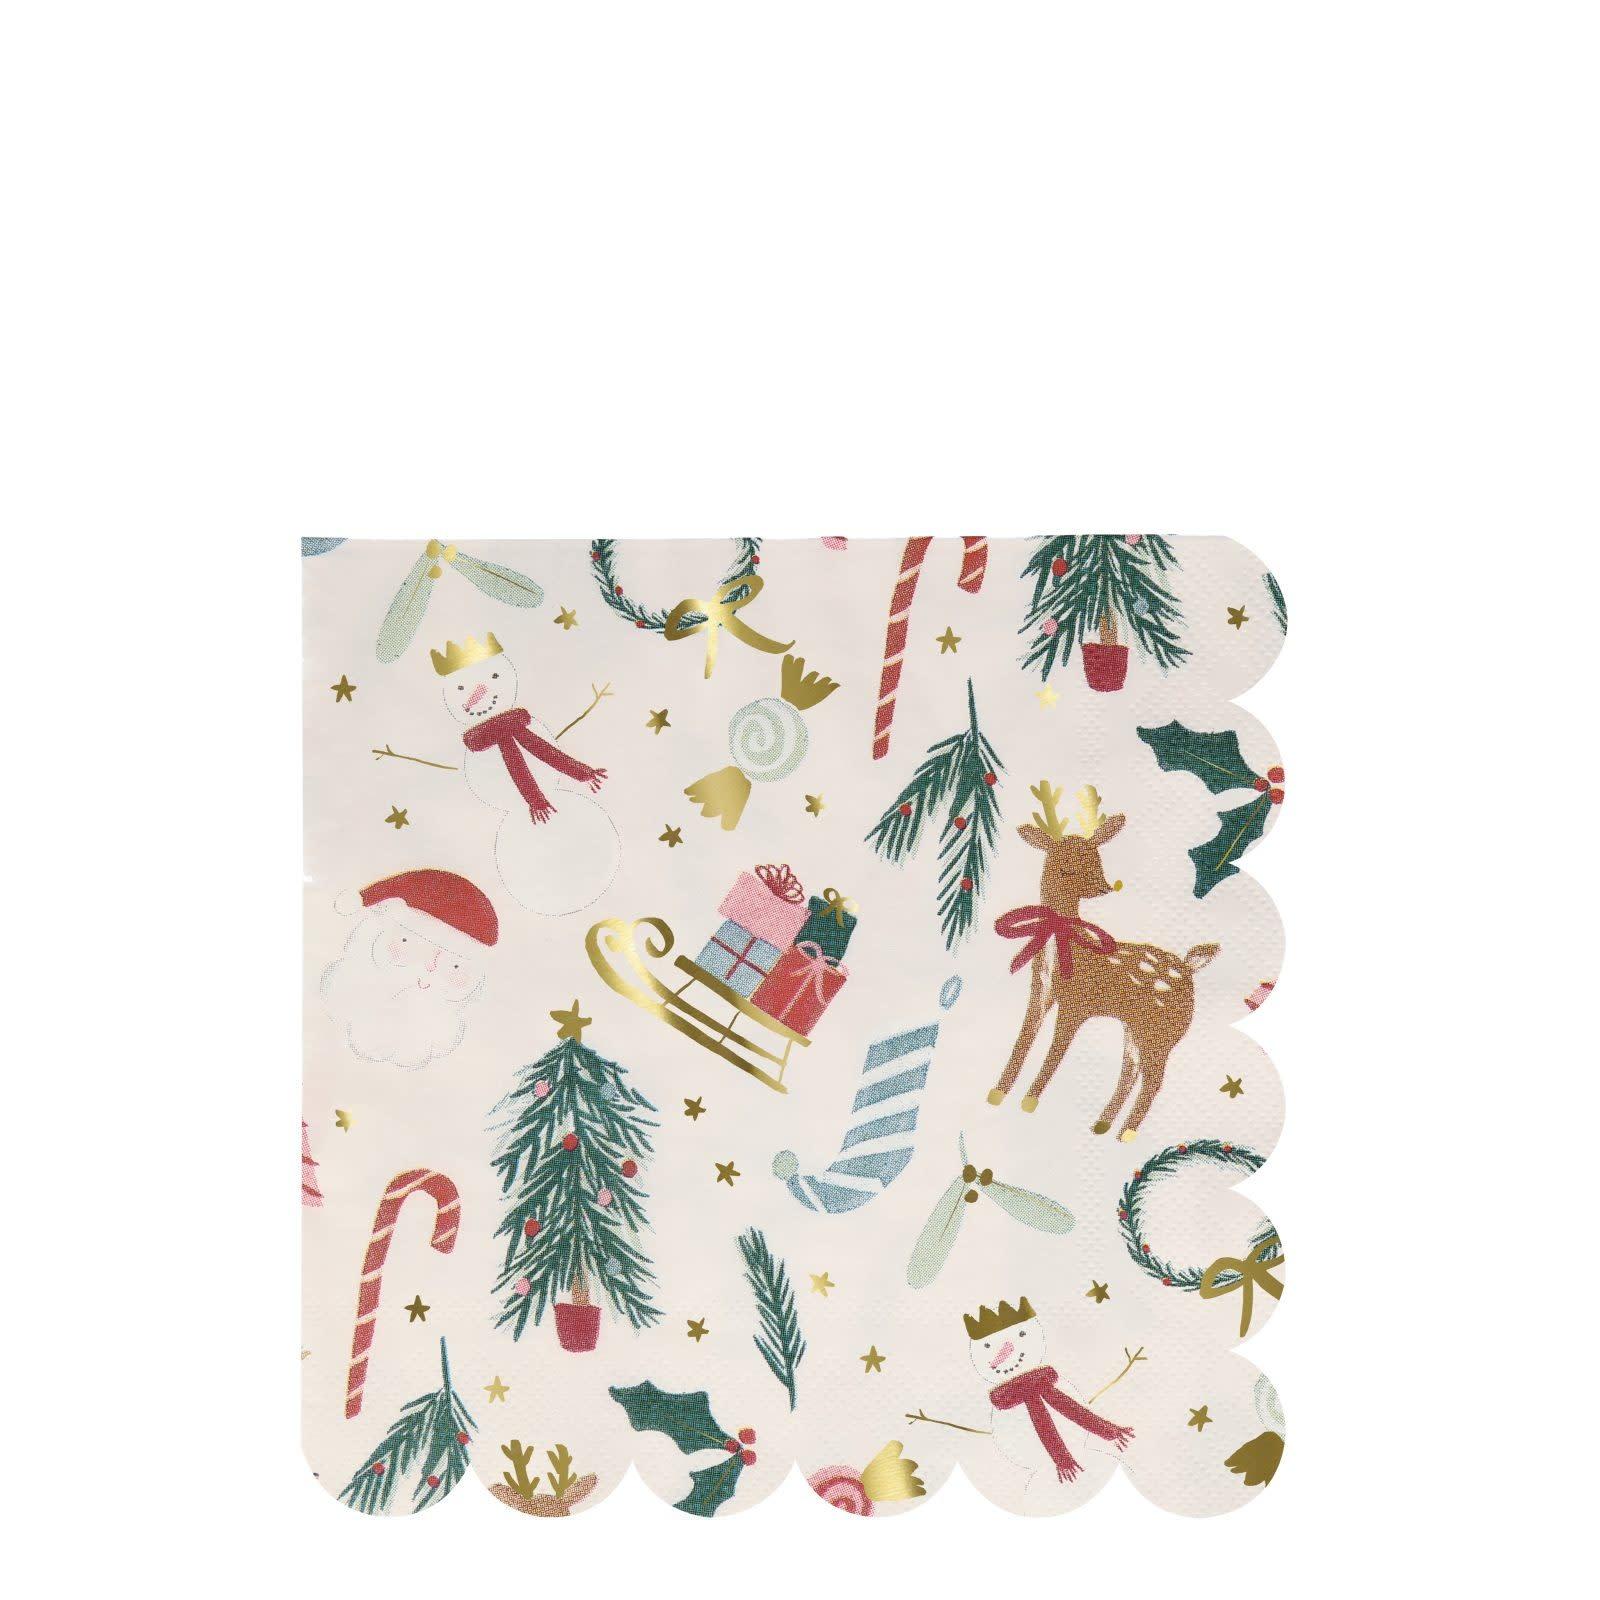 MERIMERI Festive motif napkins L